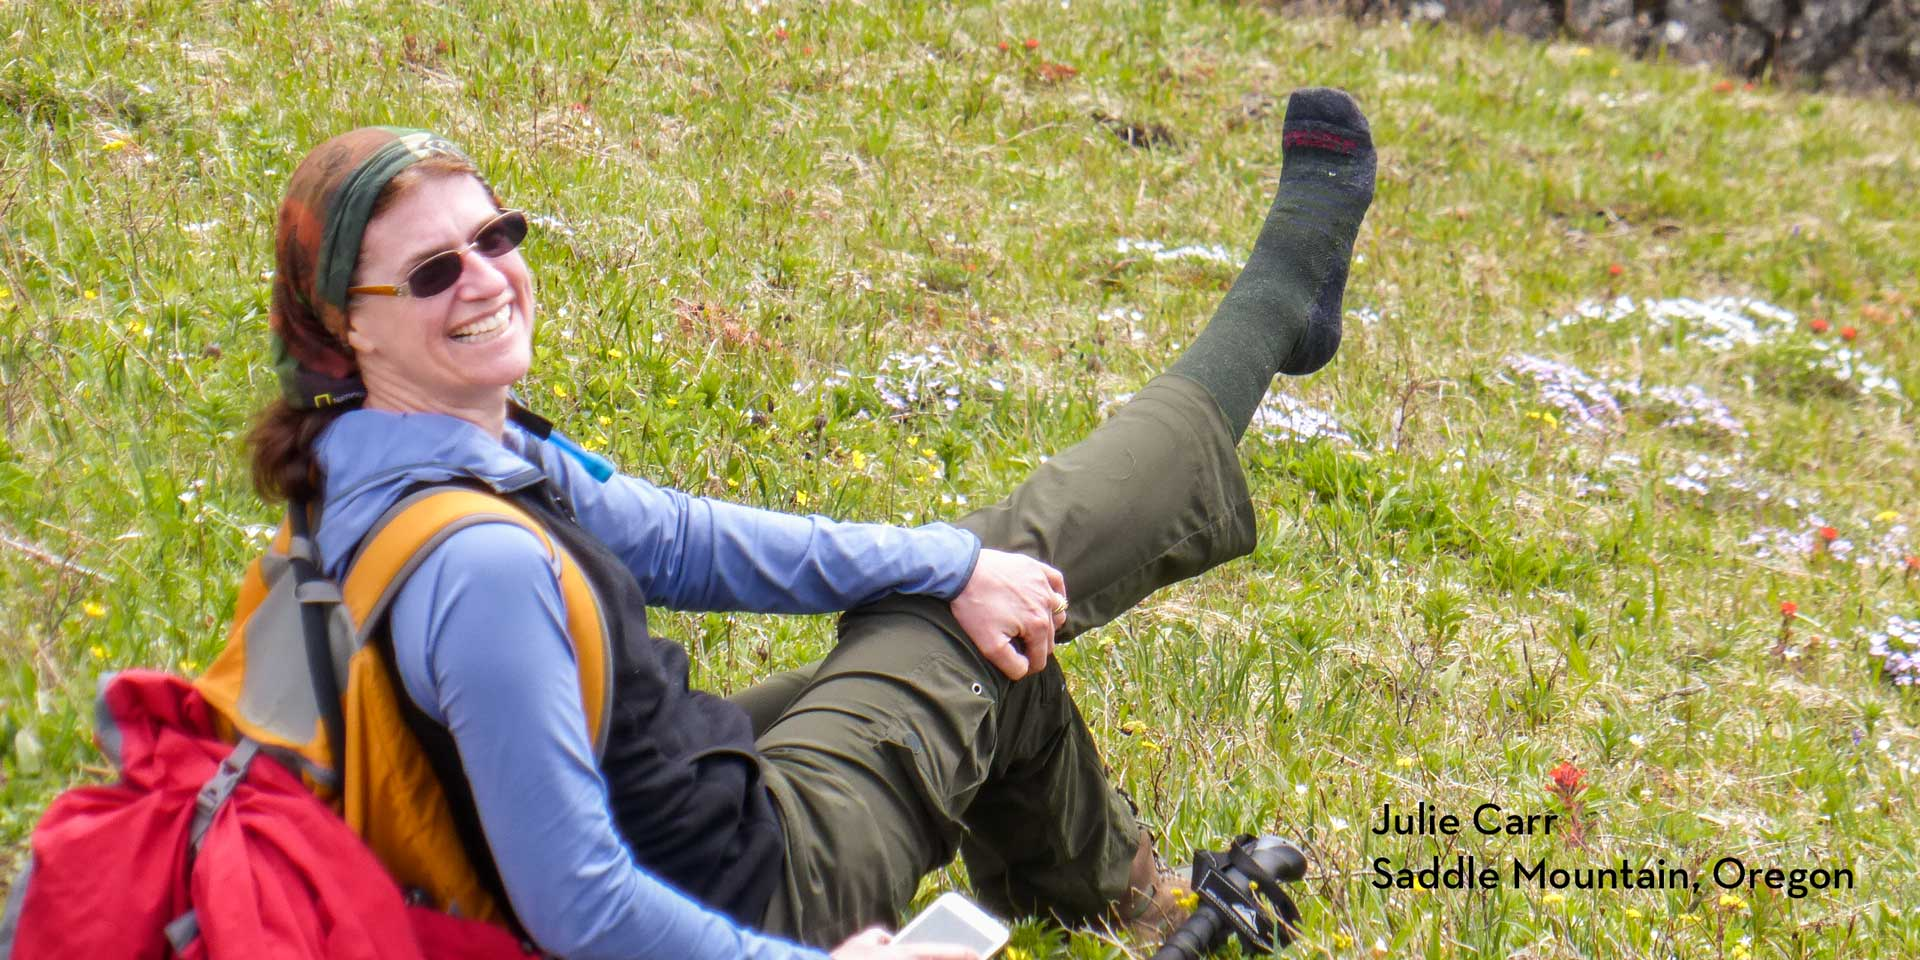 j-c-saddle-mountain-oregon-2015063002.jpg